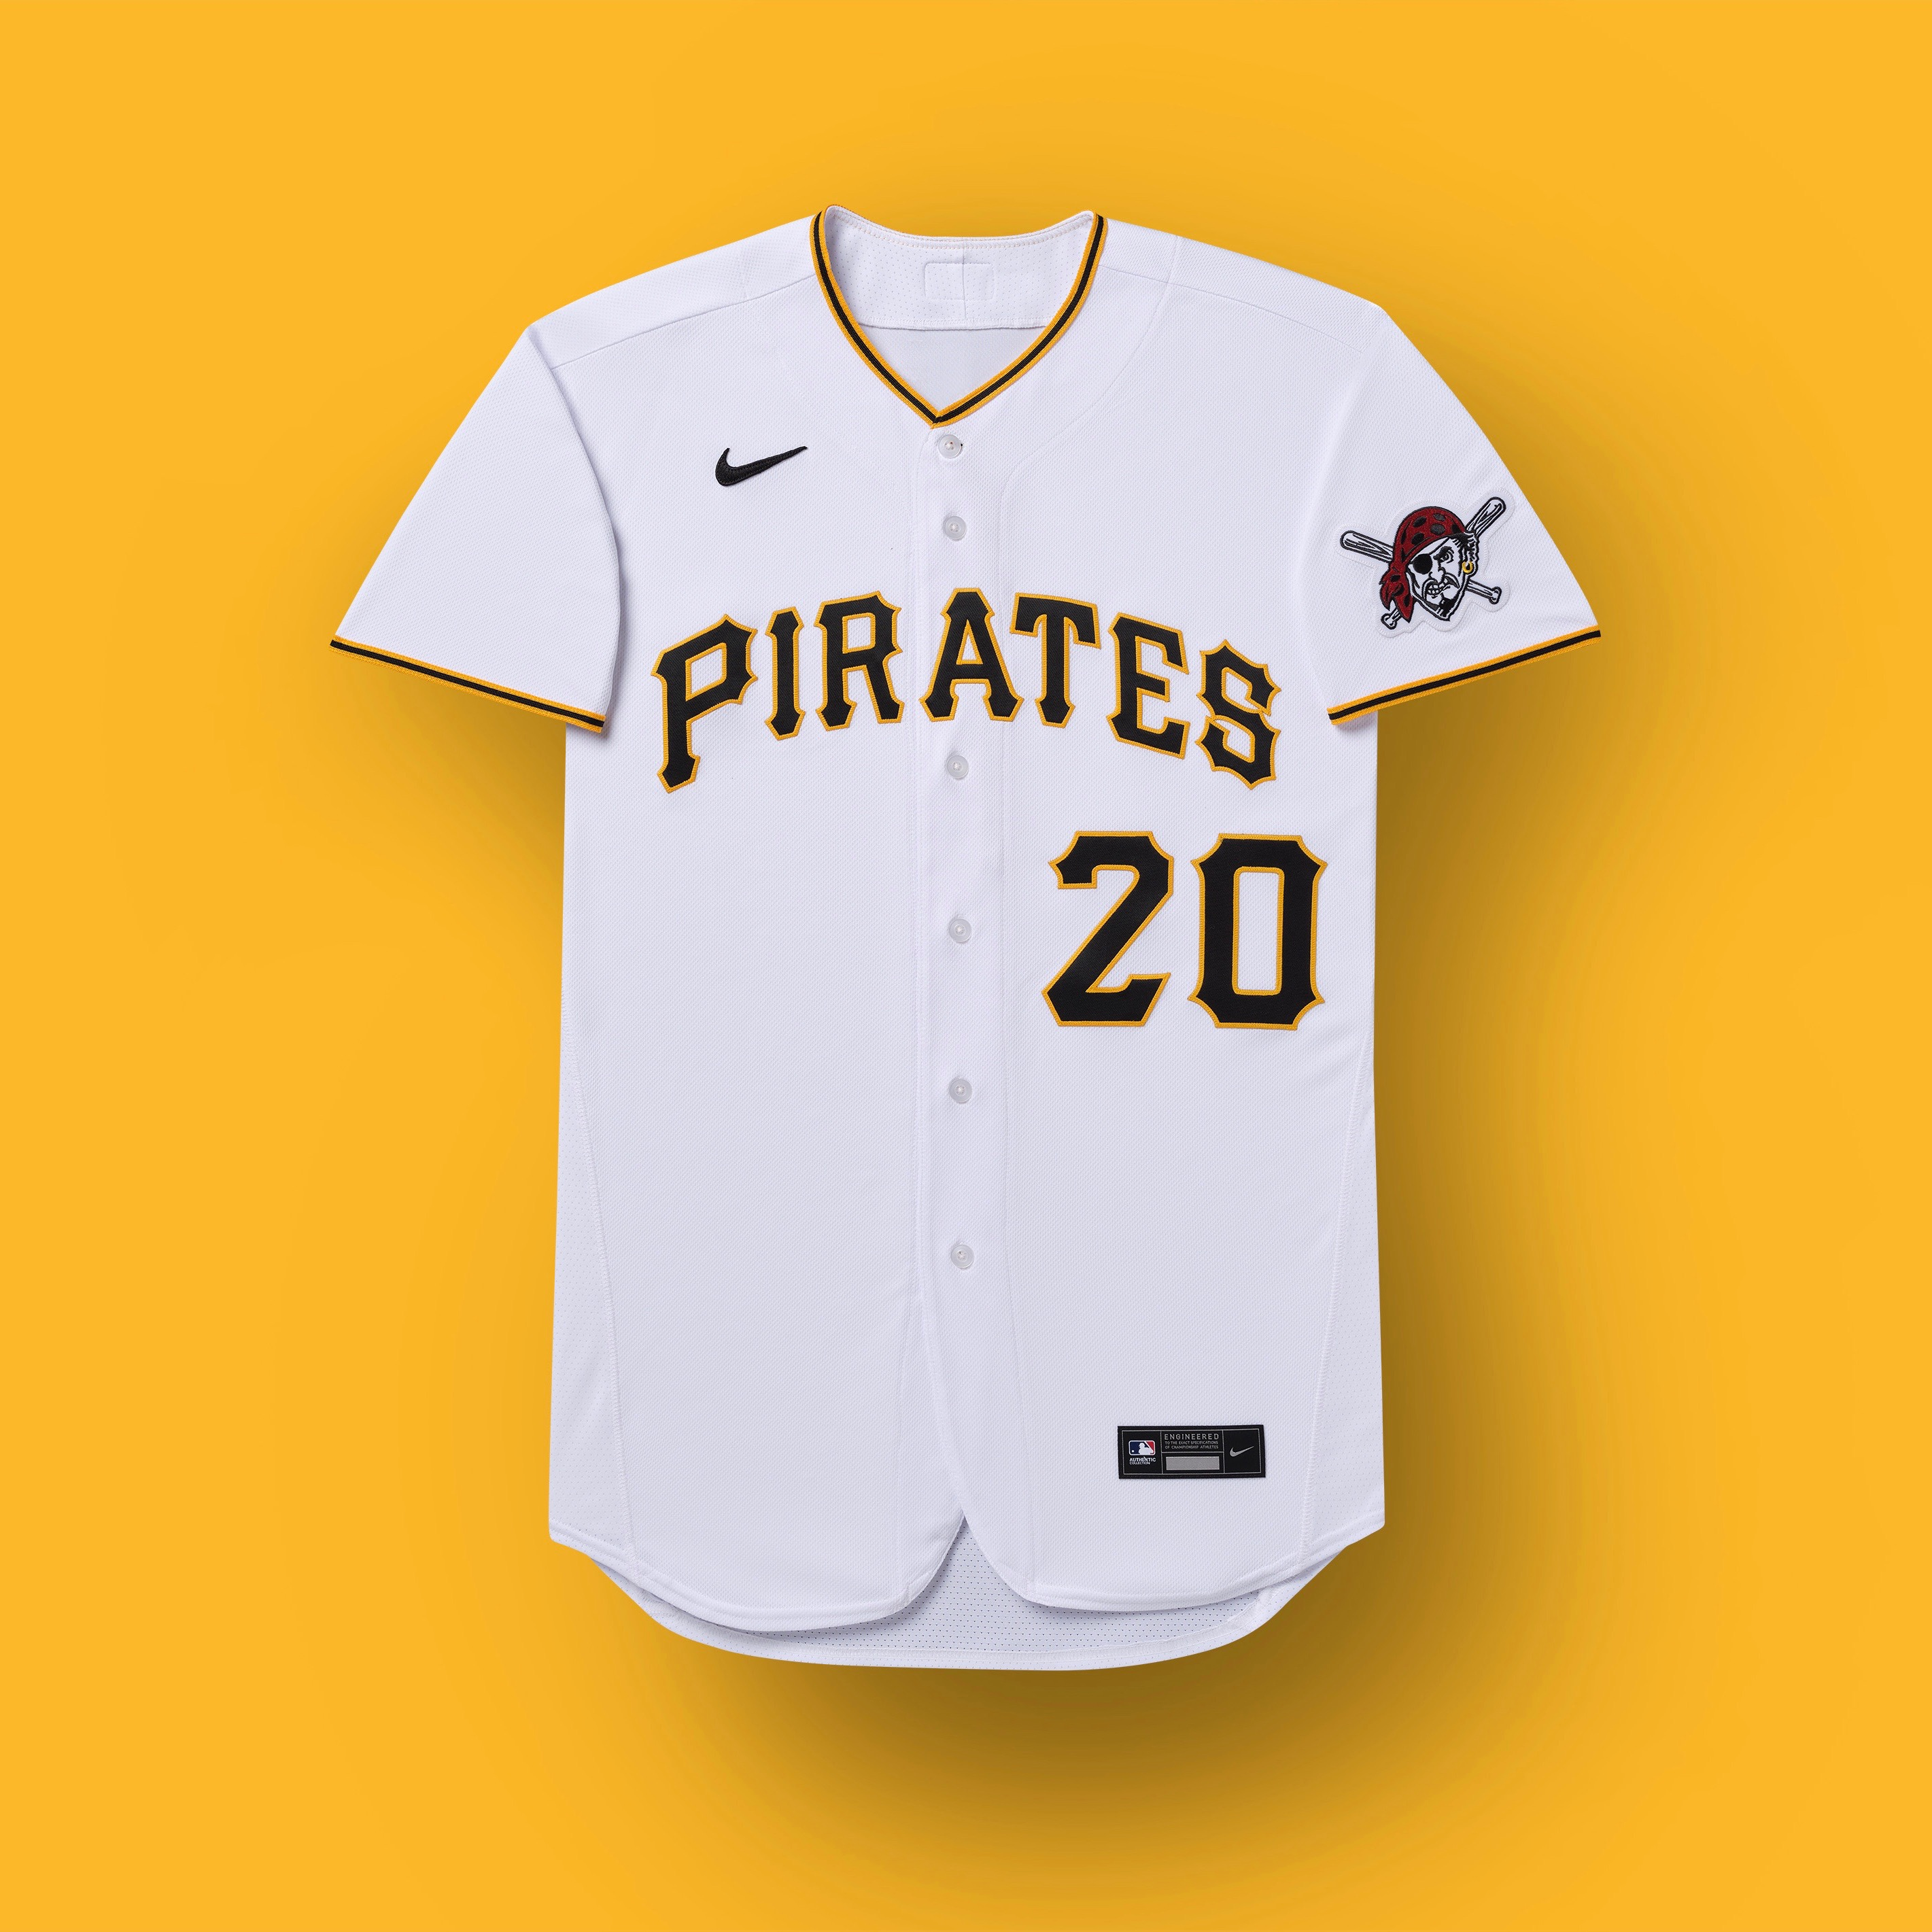 piratas de pittsburgh 2020 uniforme